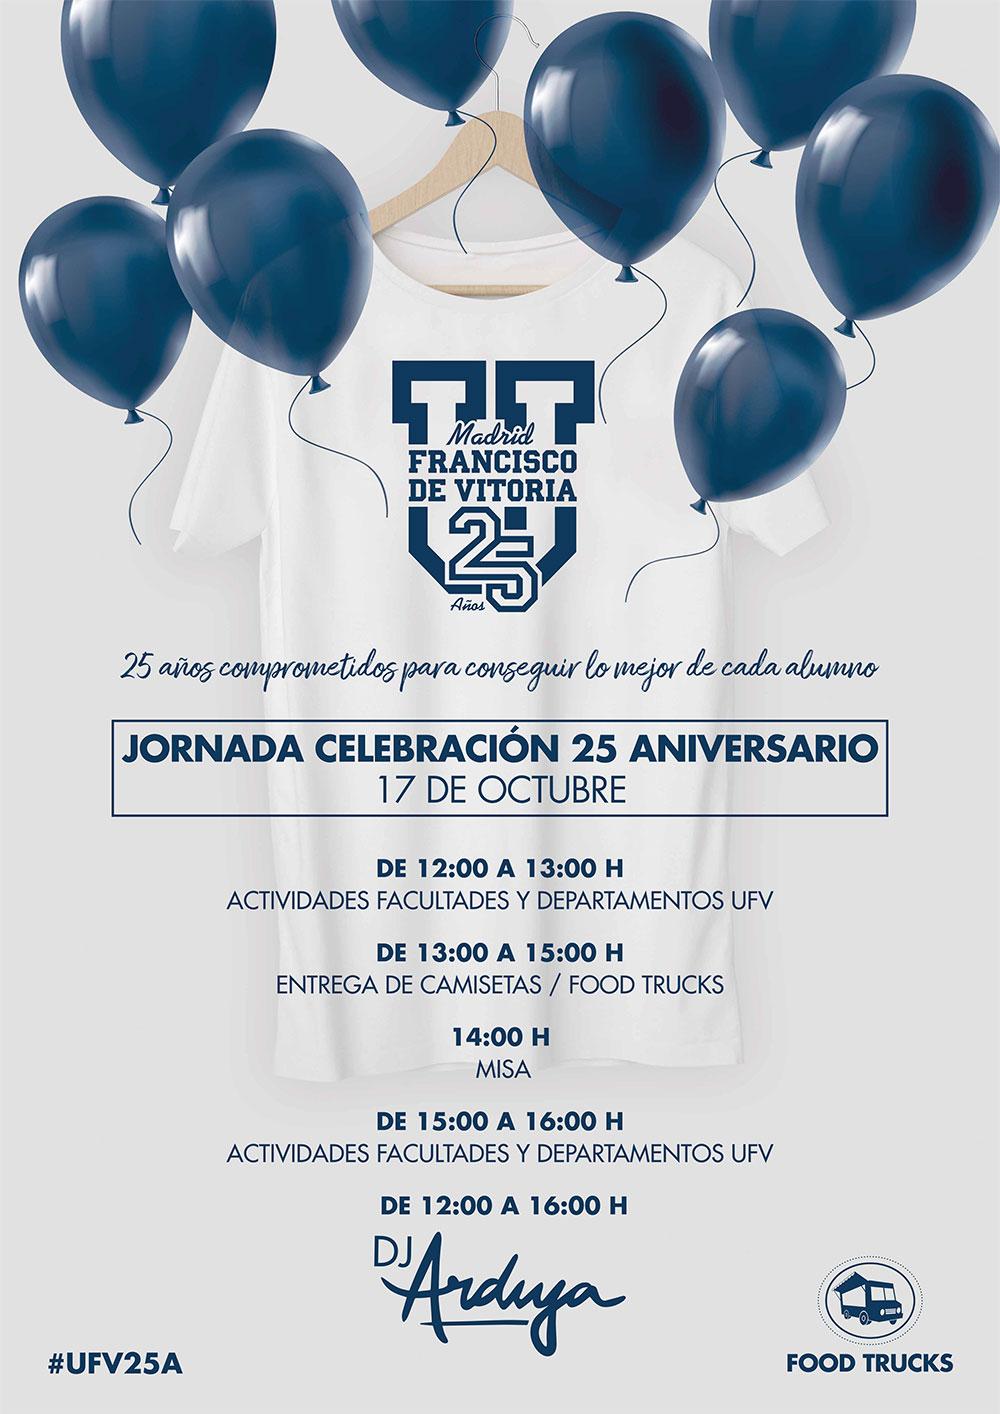 programa jornada 25aniv 1 Jornada Celebración 25 Aniversario